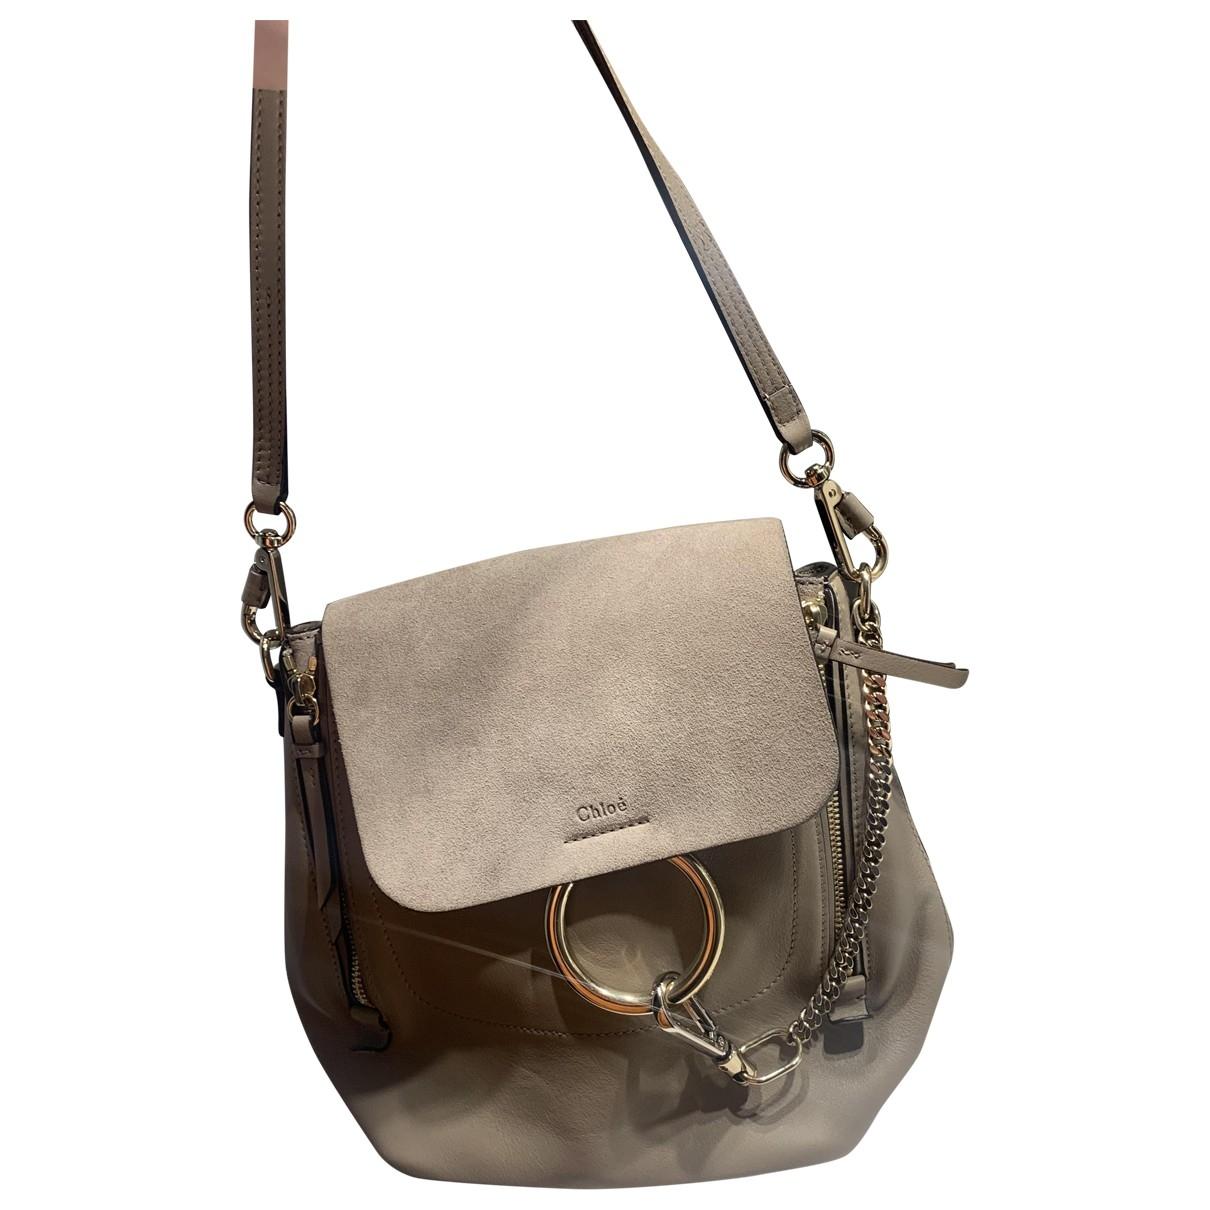 Chloé \N Beige Leather backpack for Women \N